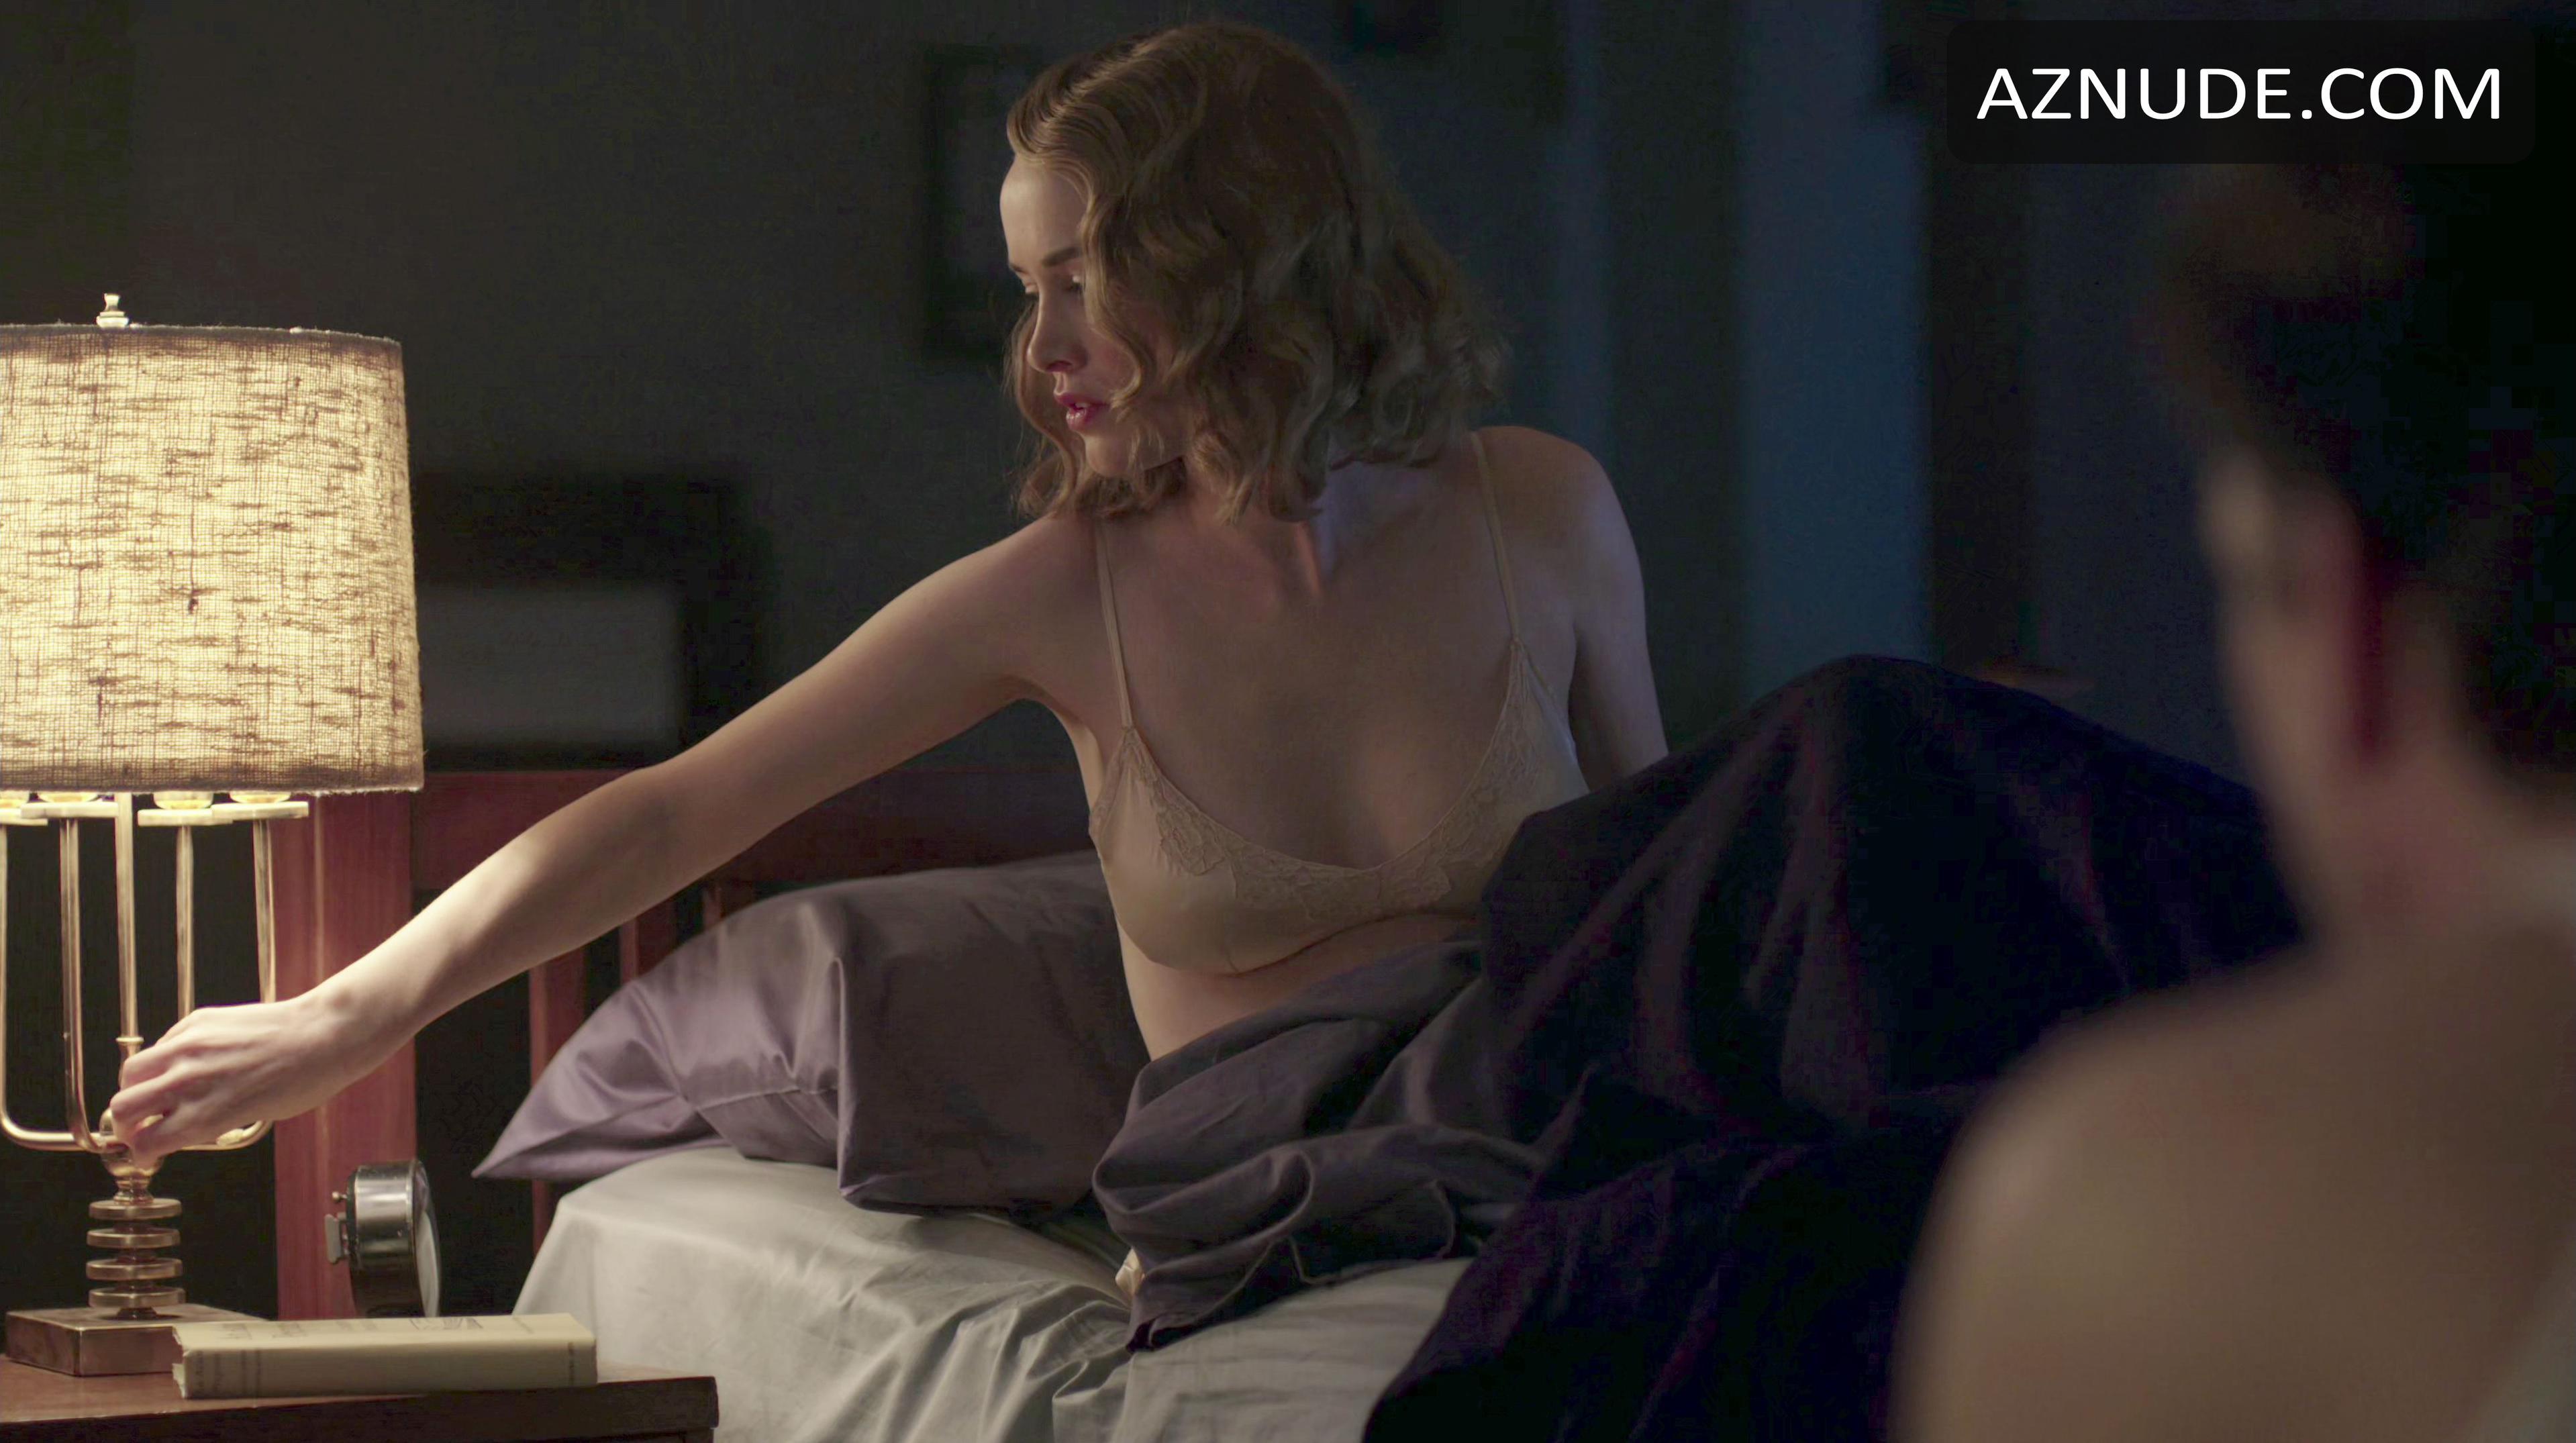 Dominique mcelligott nude pics-6792